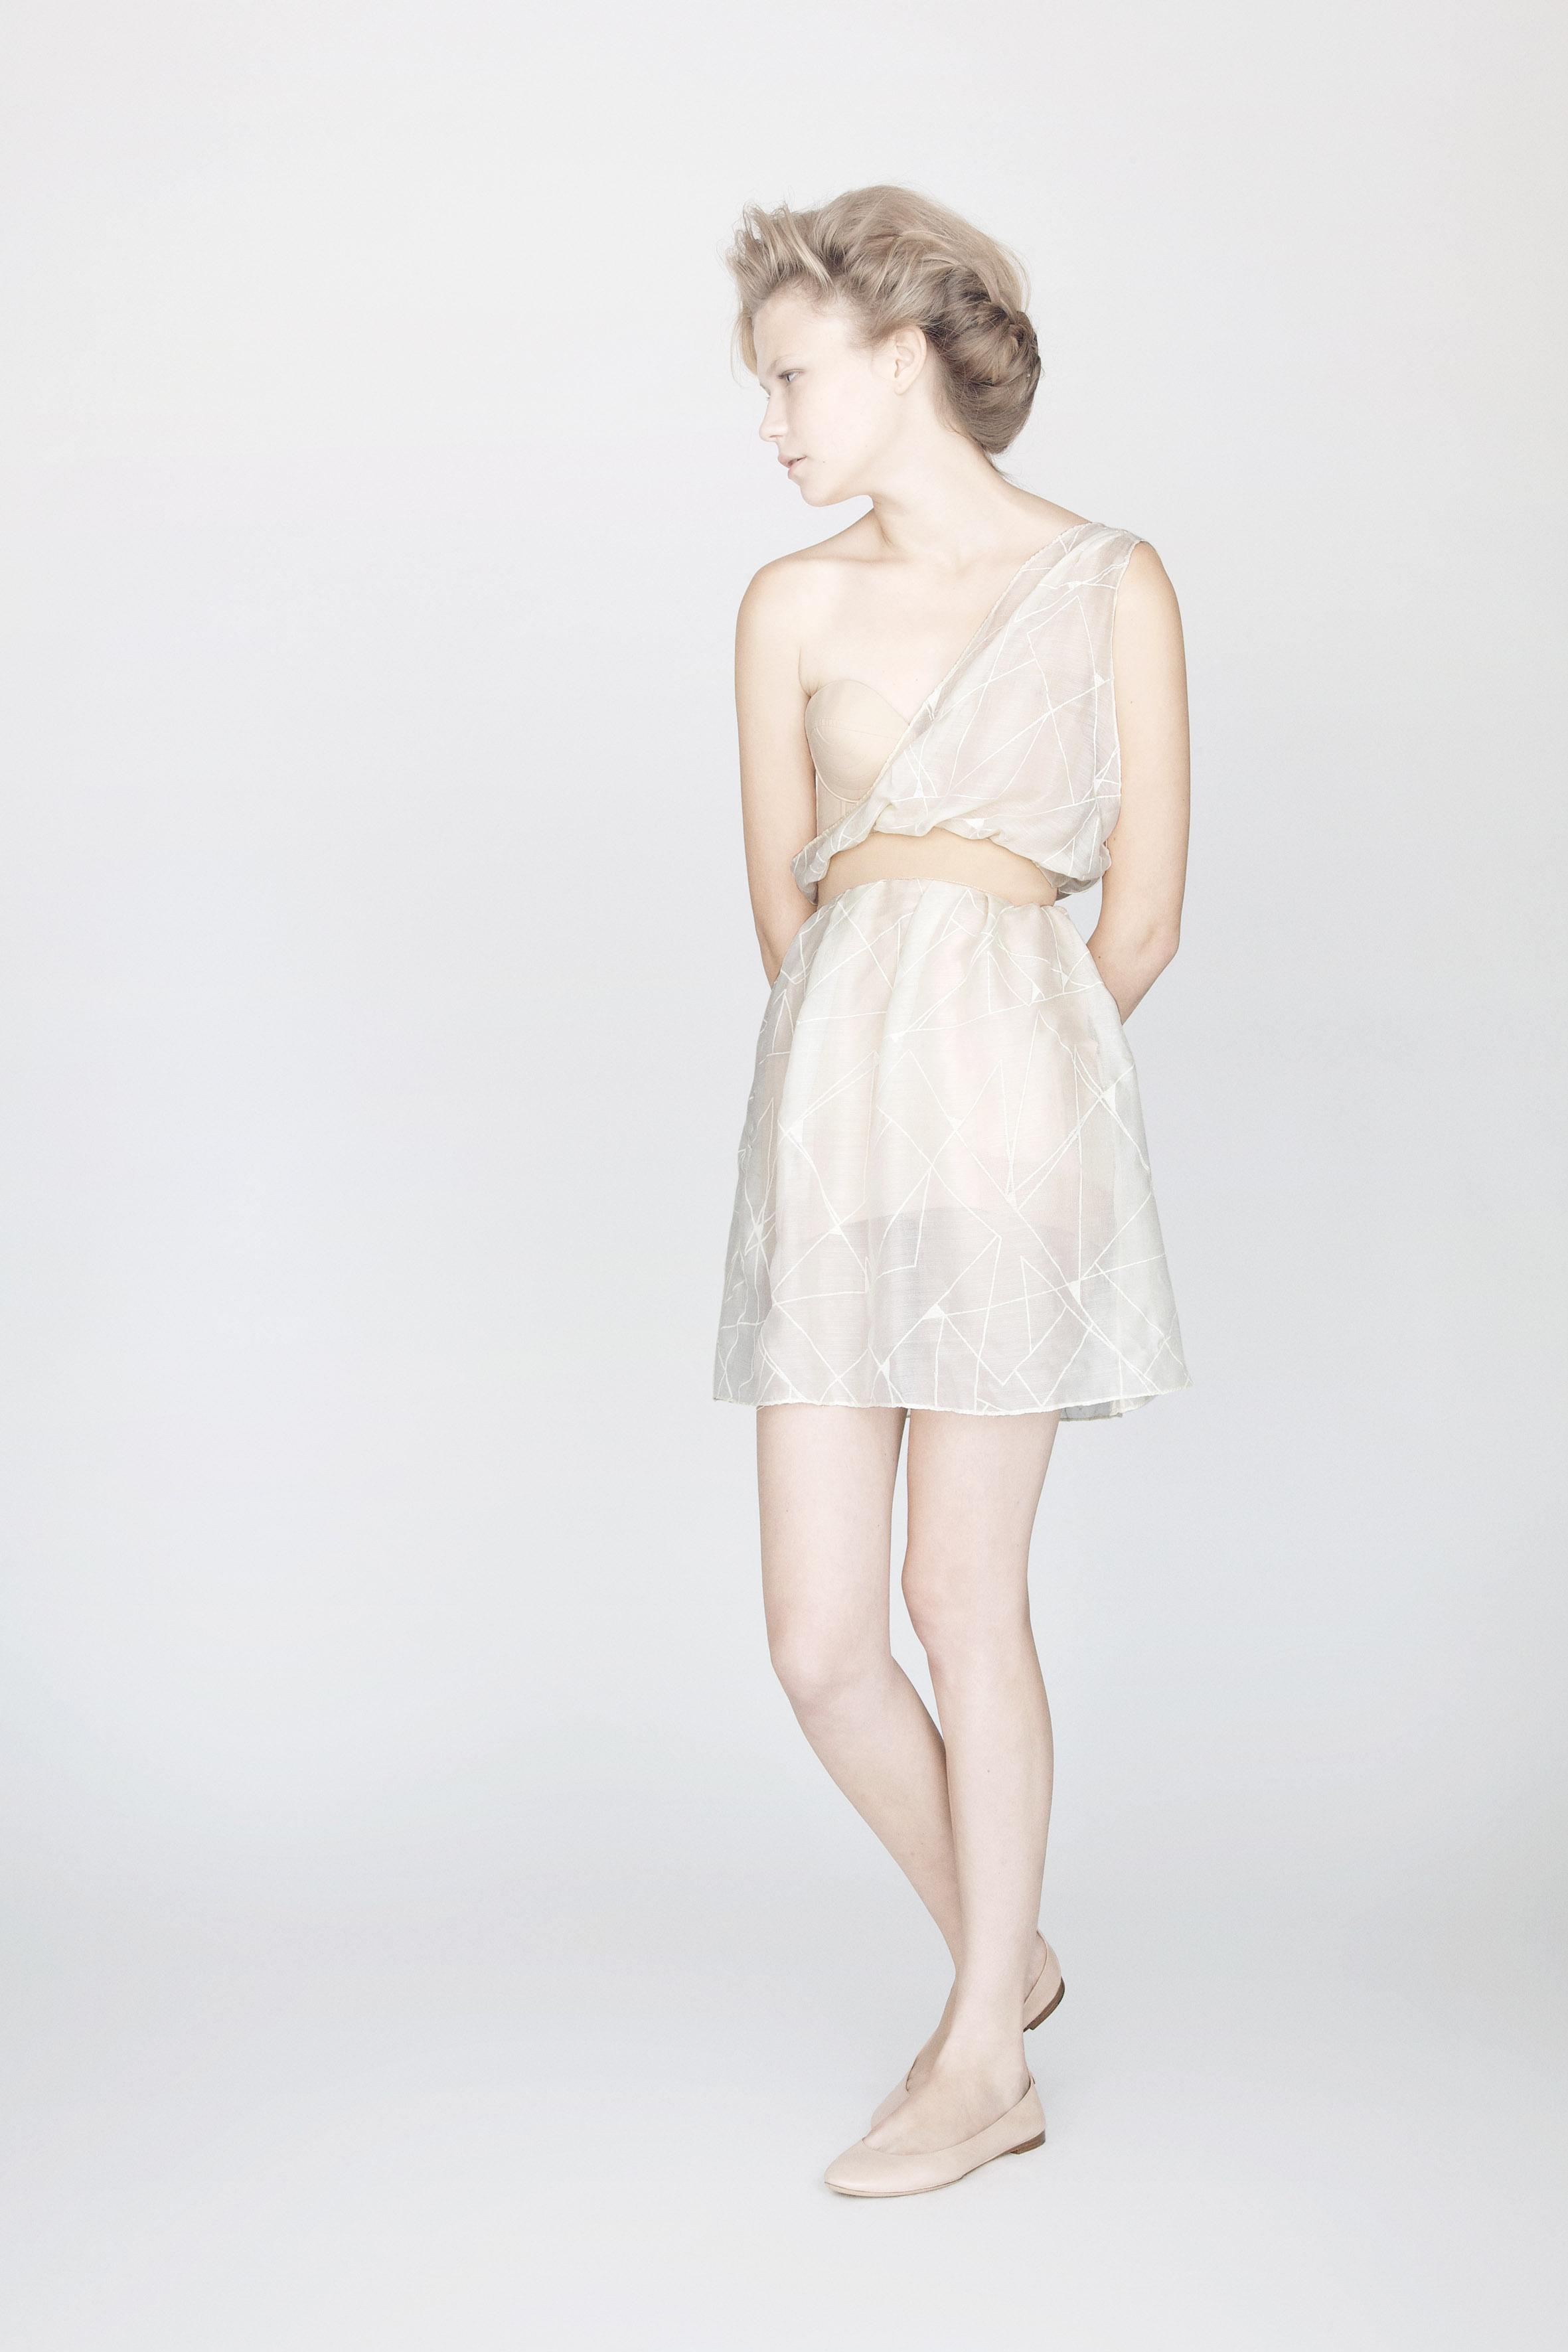 ASYMMETRIC MOUSSELINE DRESS IN HAND PRINTED SPIDERWEB PRINT.jpg